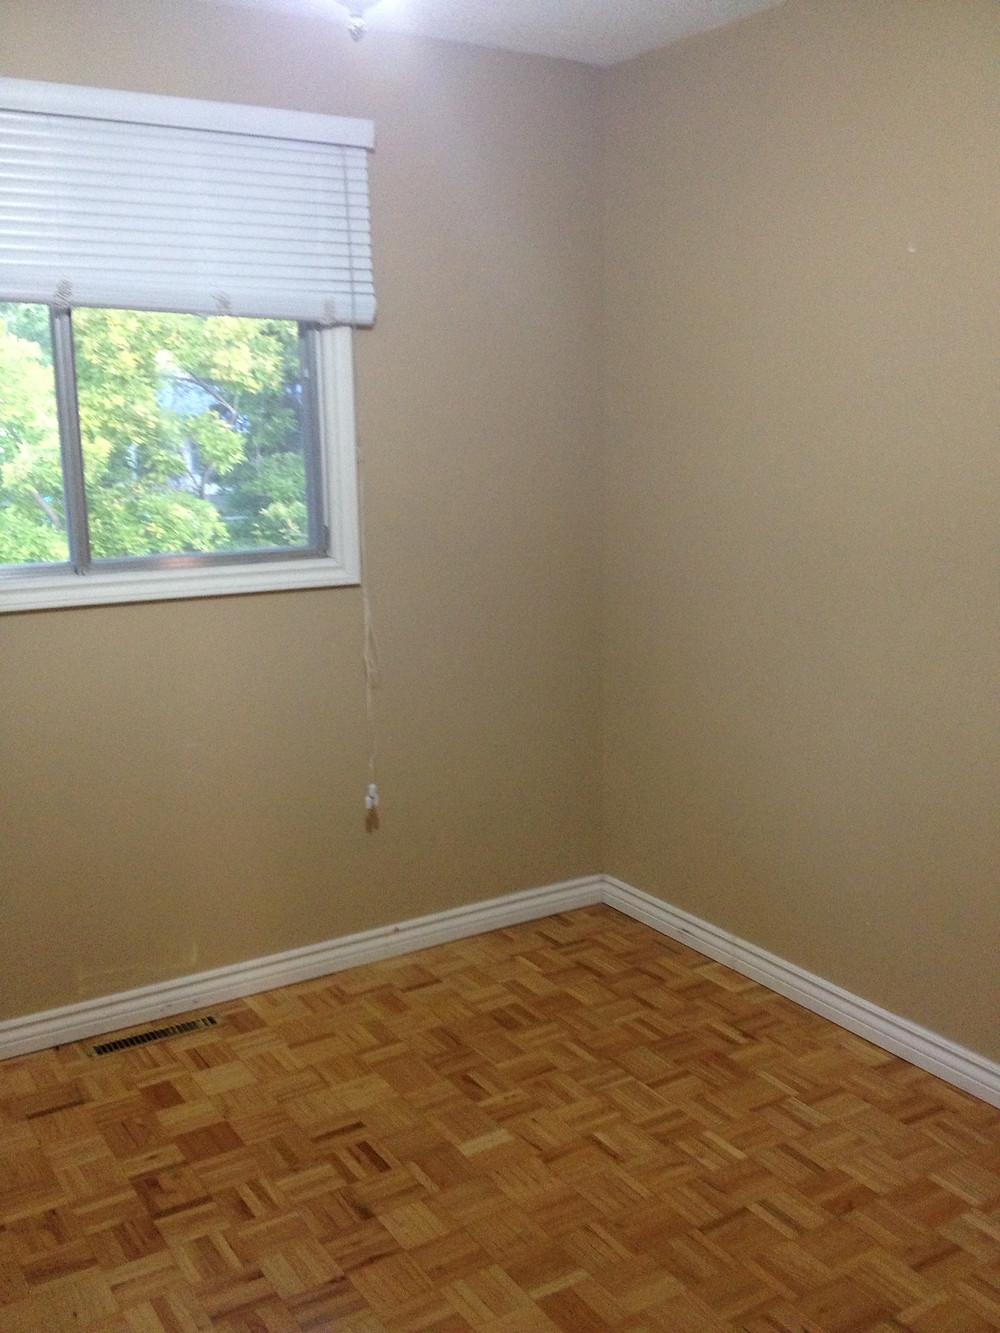 ray's room.JPG